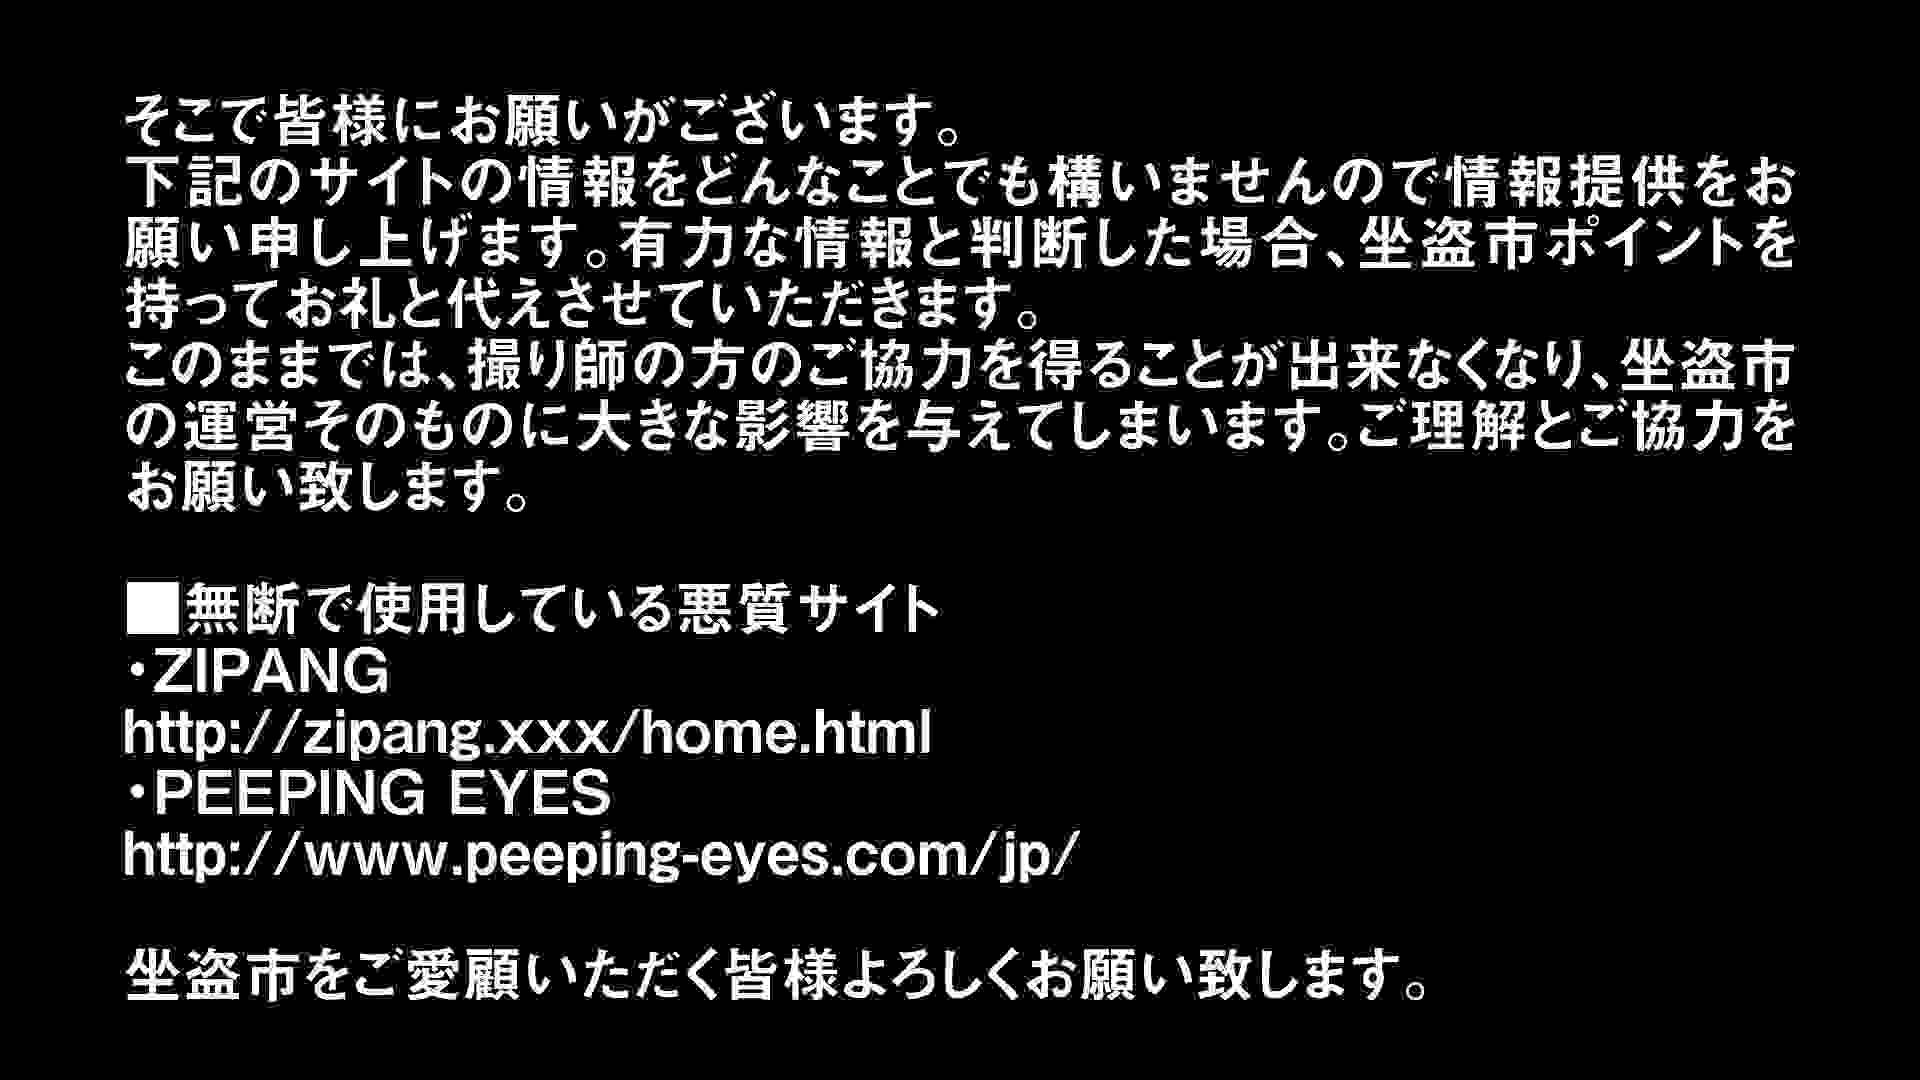 Aquaな露天風呂Vol.301 OLのエロ生活 すけべAV動画紹介 112連発 41